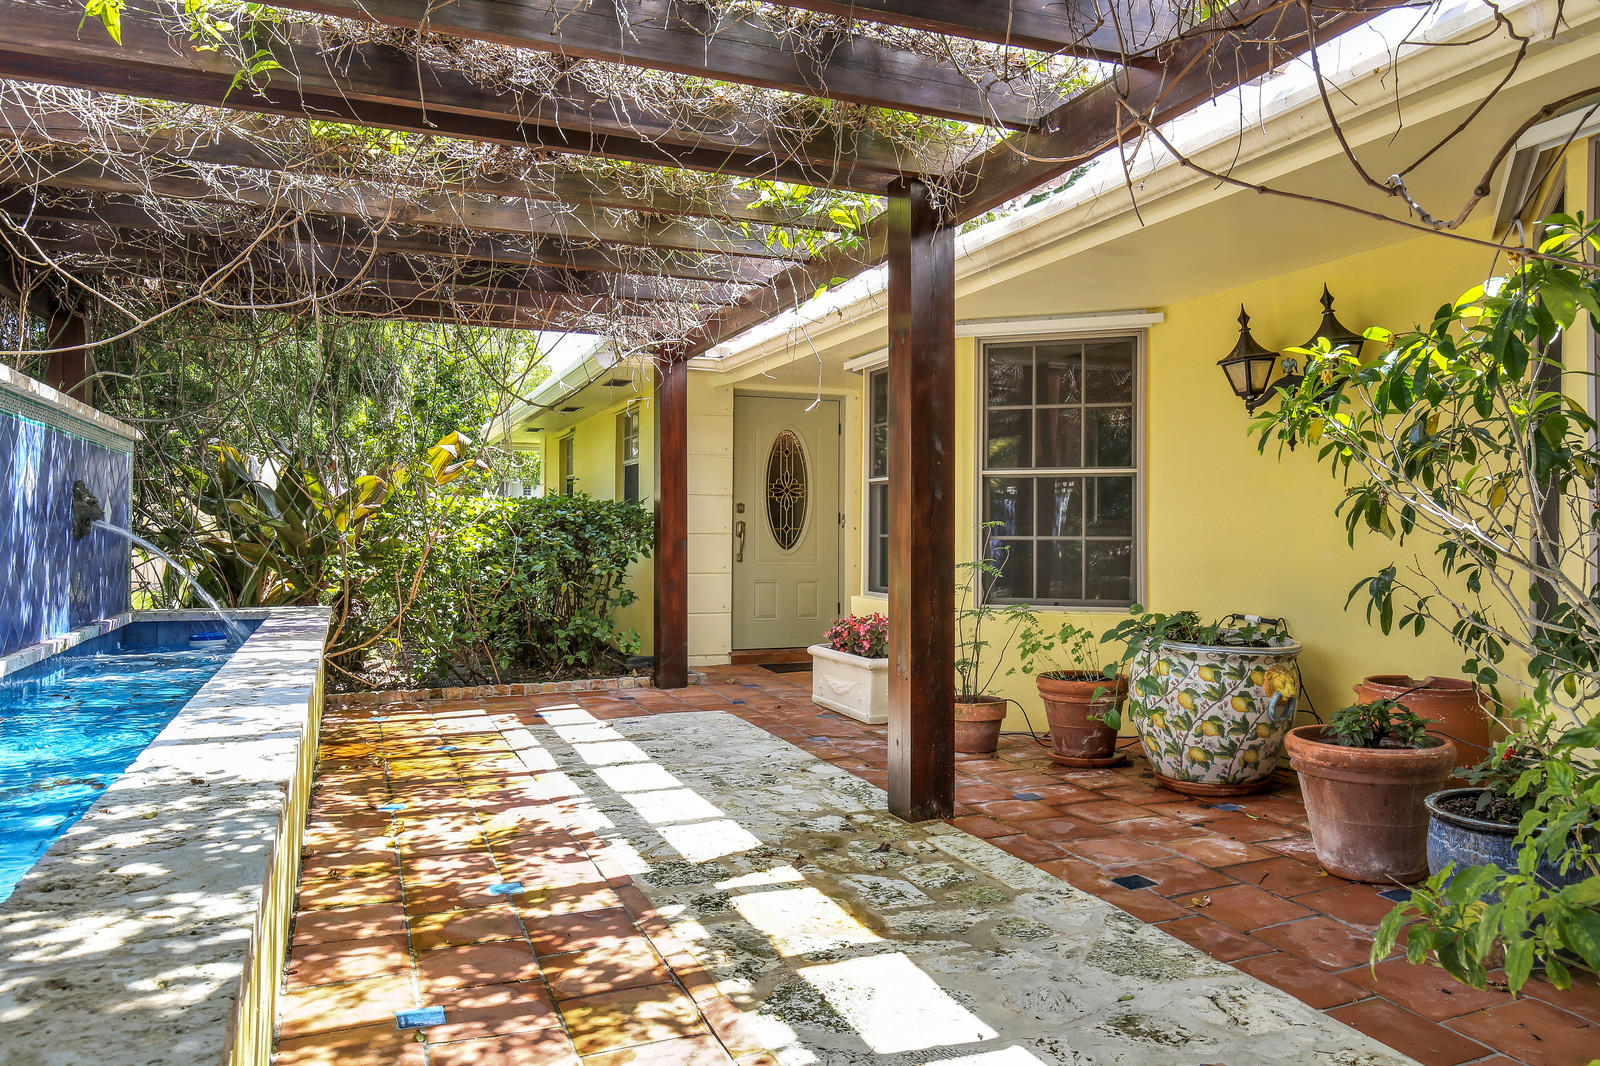 4596 Spruce Lane Palm Beach Gardens, FLORIDA 33418 | PGA NATIONAL ...